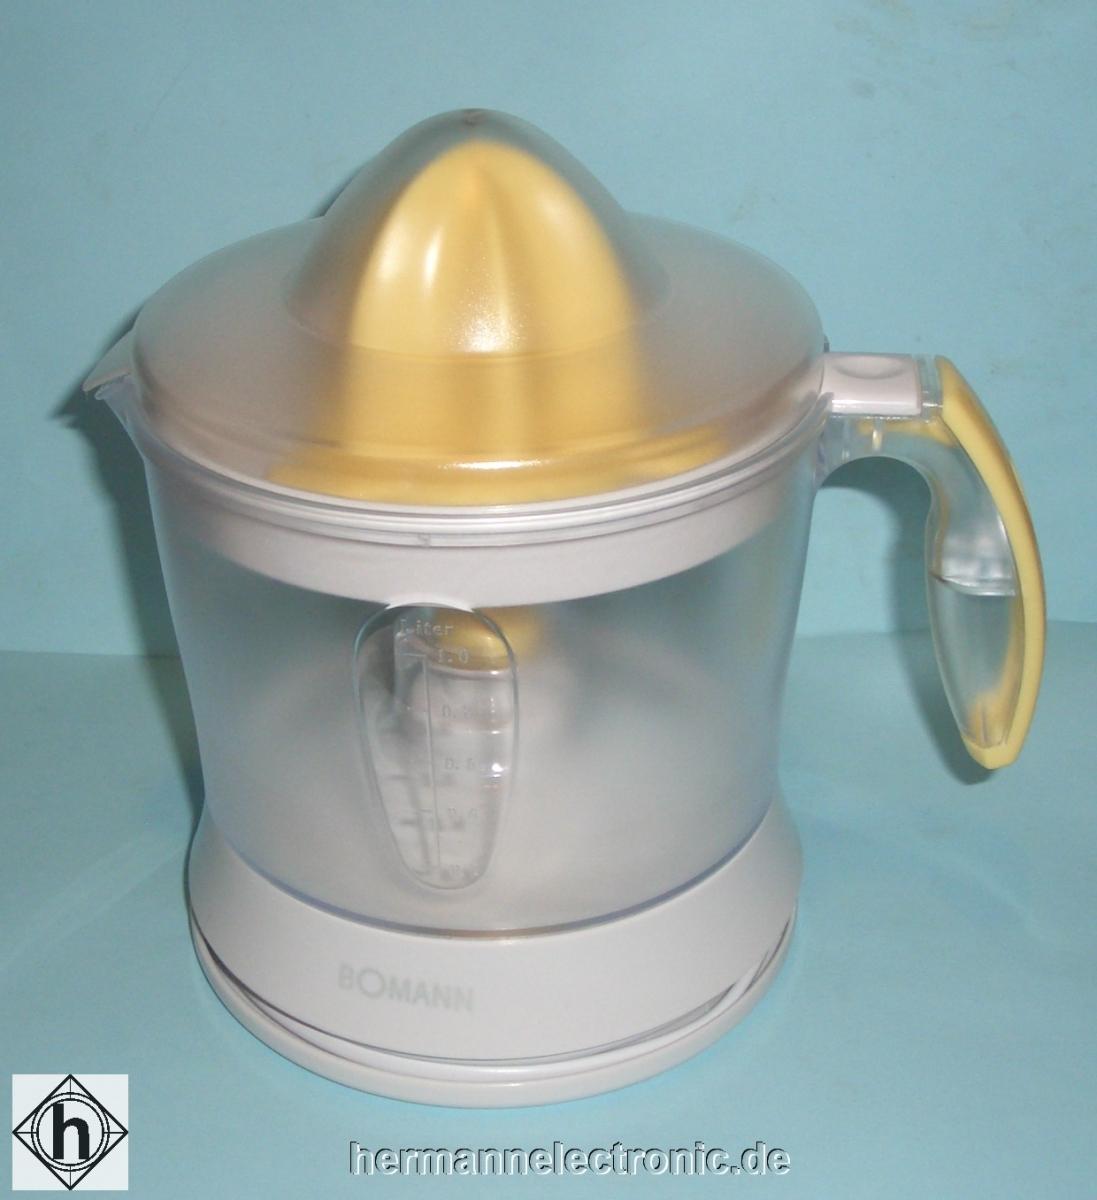 Bomann  CB 1000 citrus press 1 liter